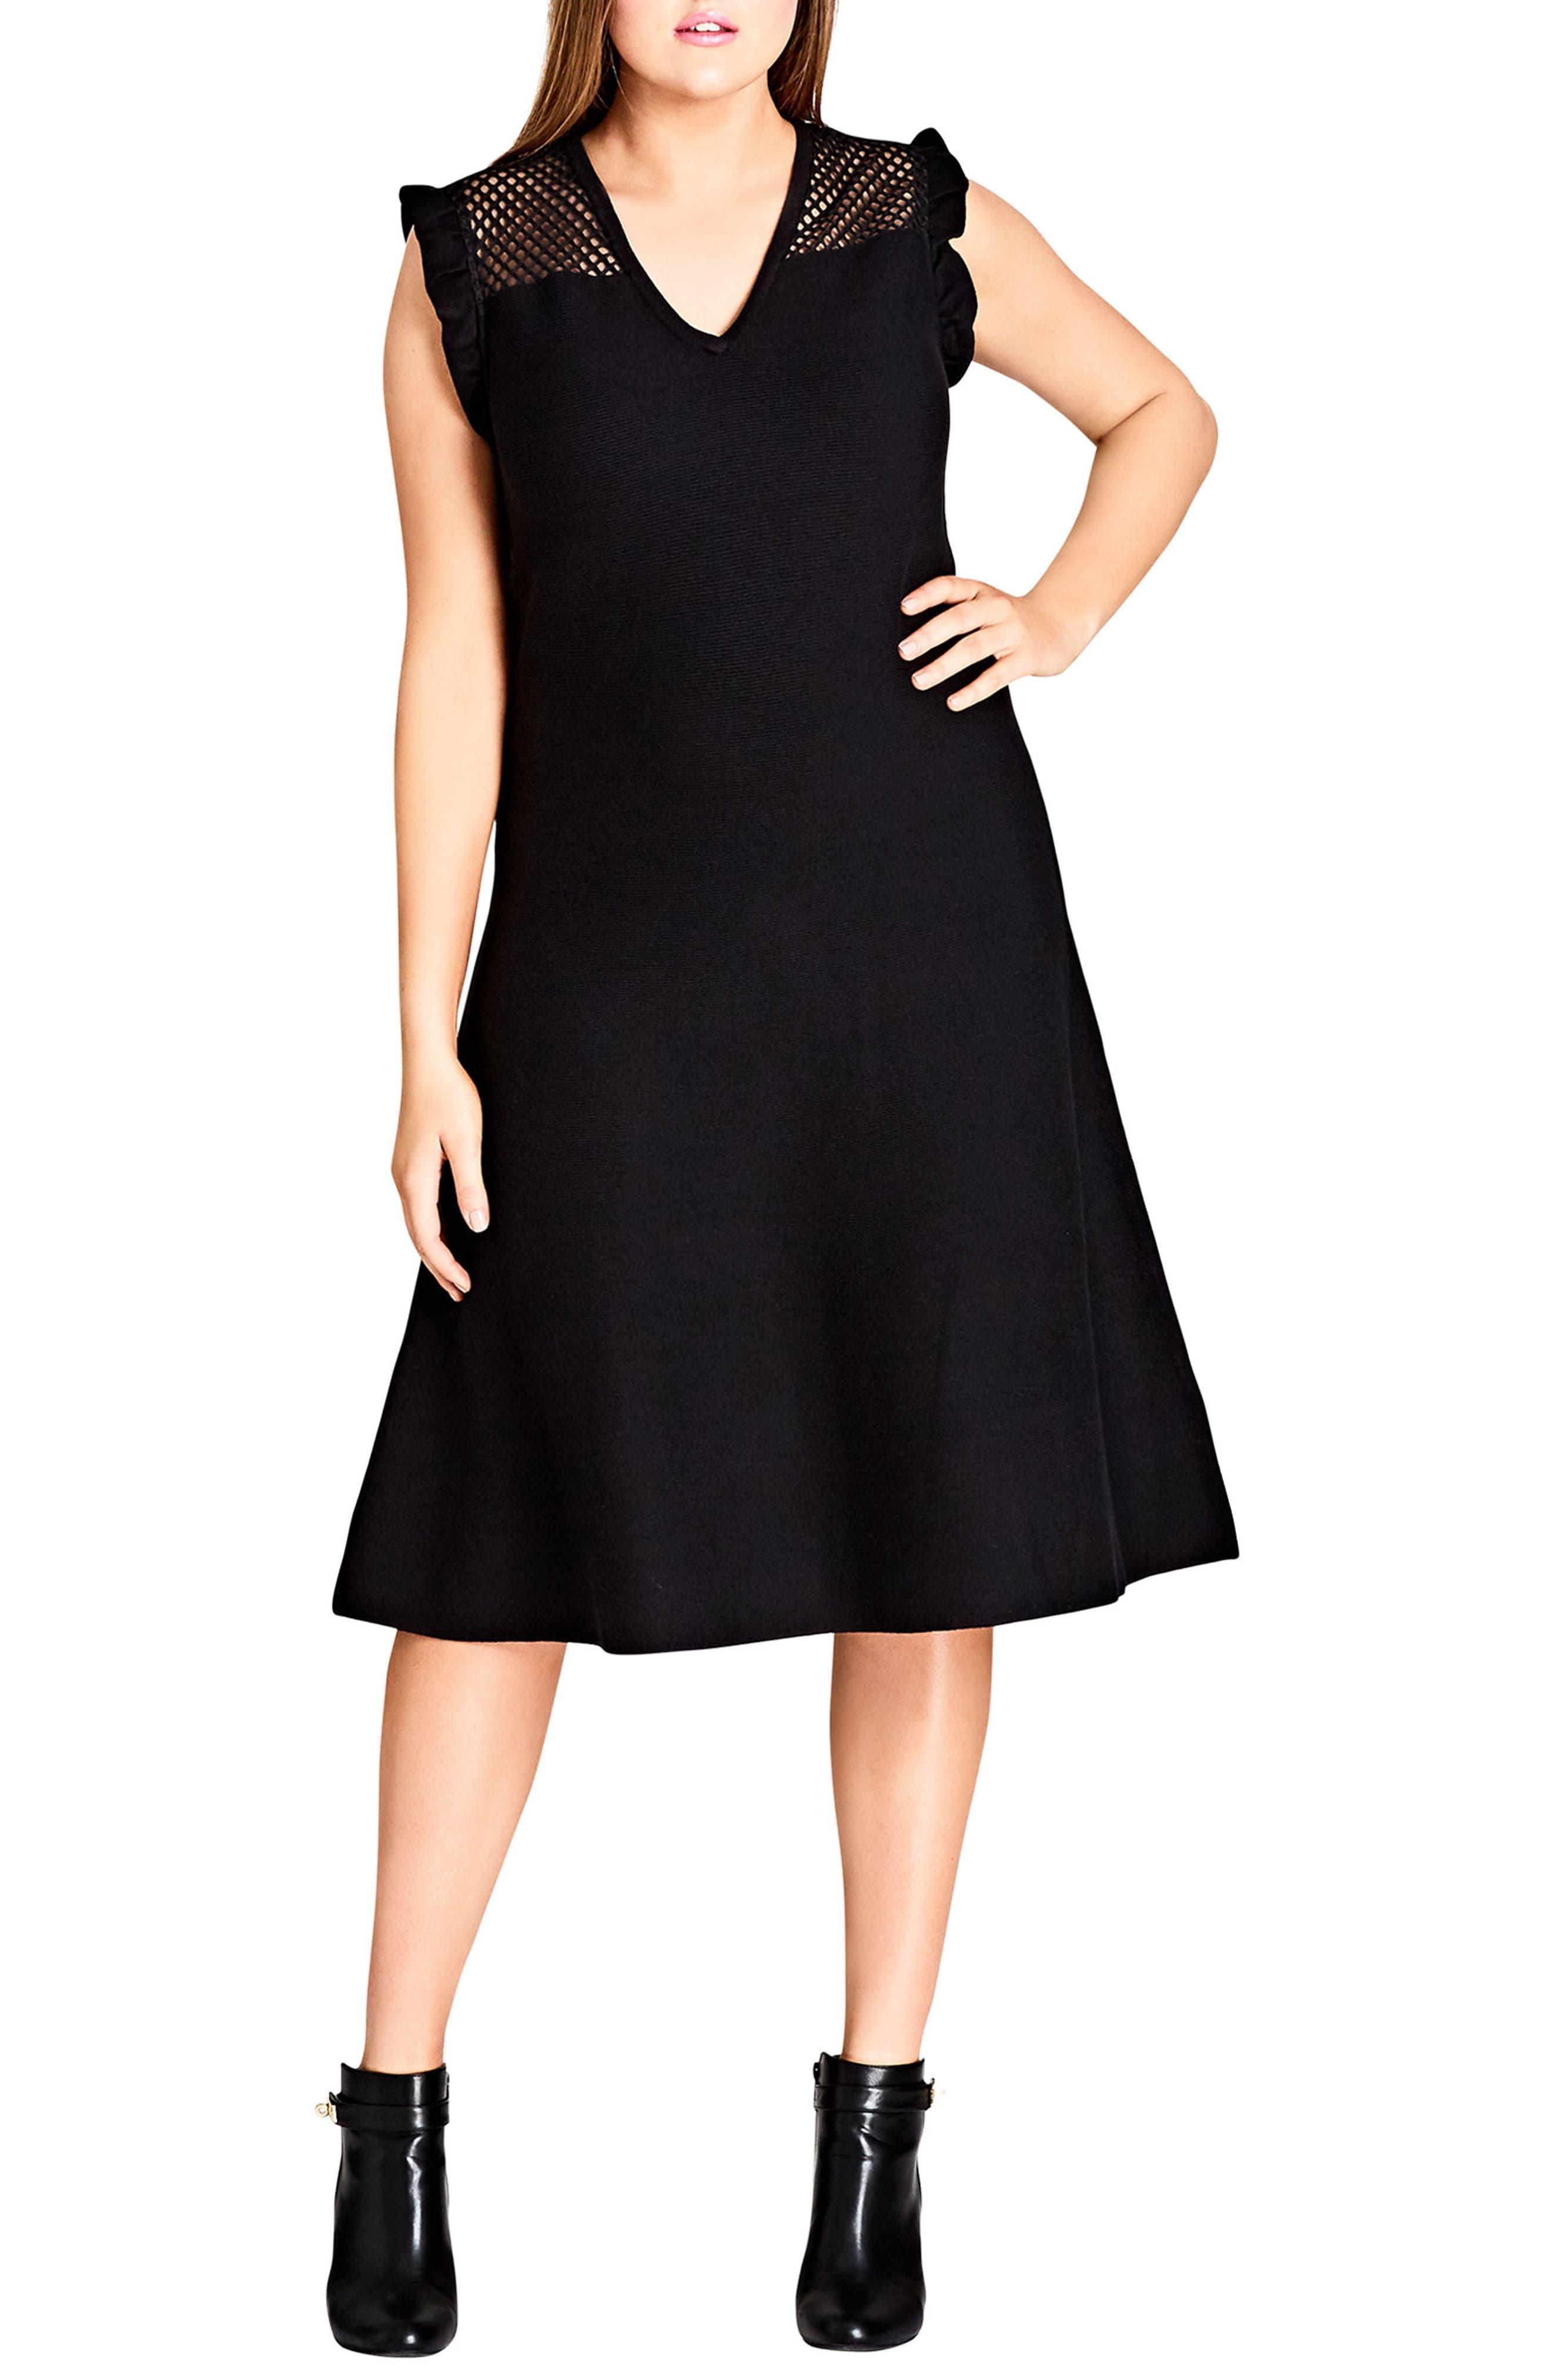 CITY CHIC,                             Charmer Fit & Flare Midi Dress,                             Main thumbnail 1, color,                             001